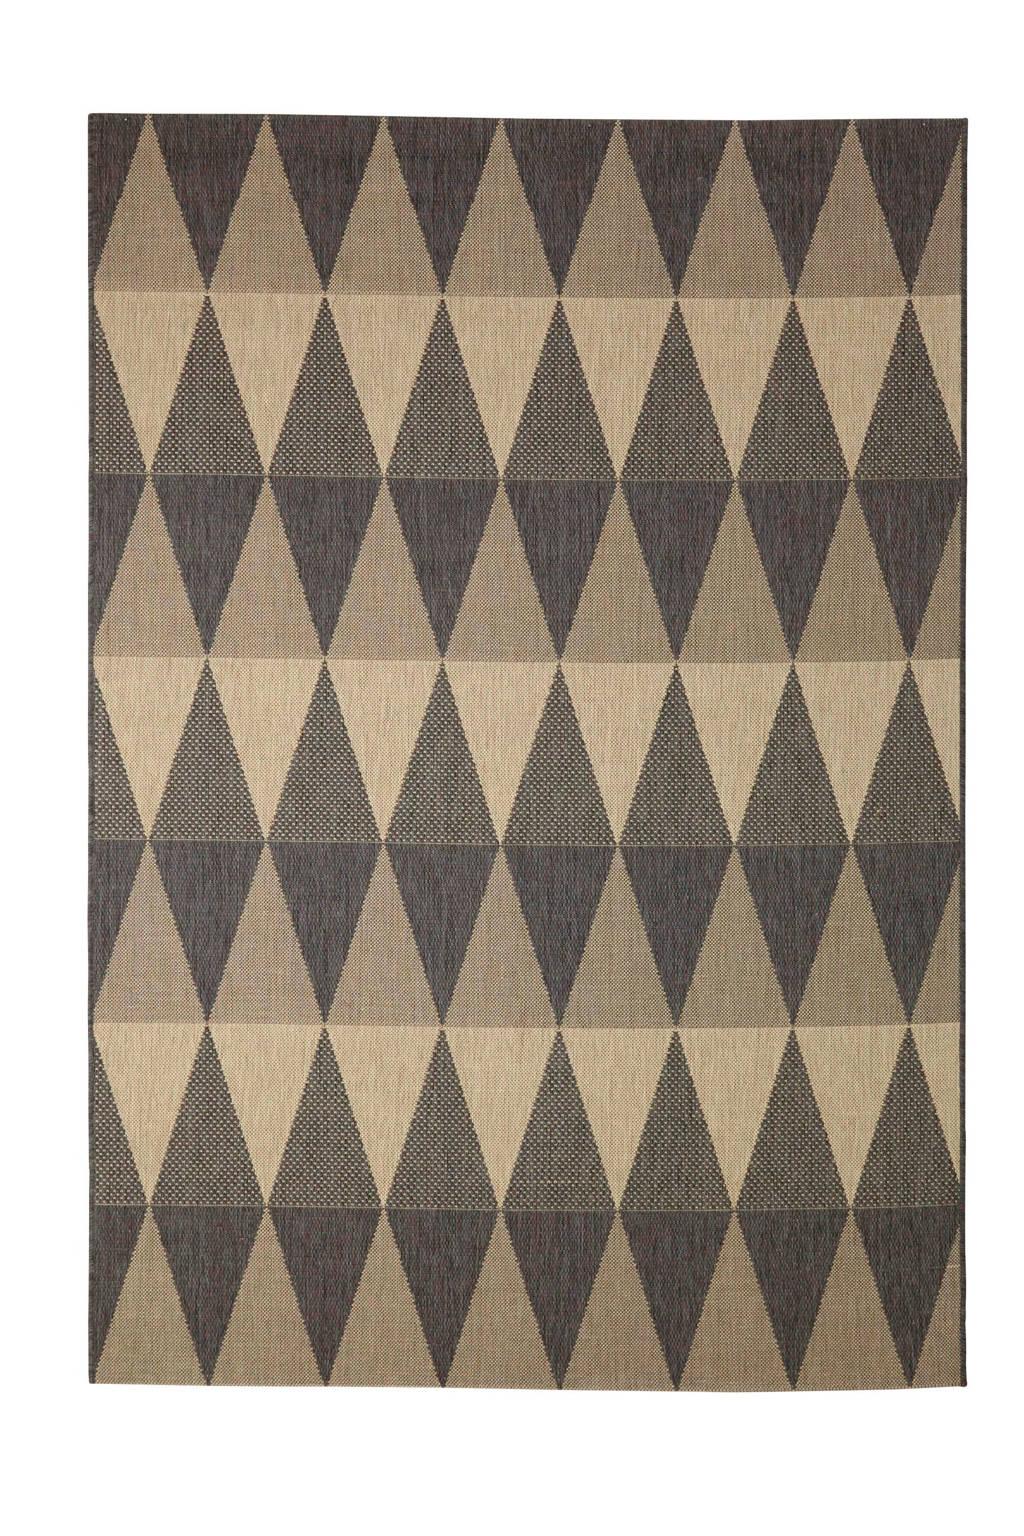 whkmp's own Vloerkleed  (230x160 cm), antraciet/zand